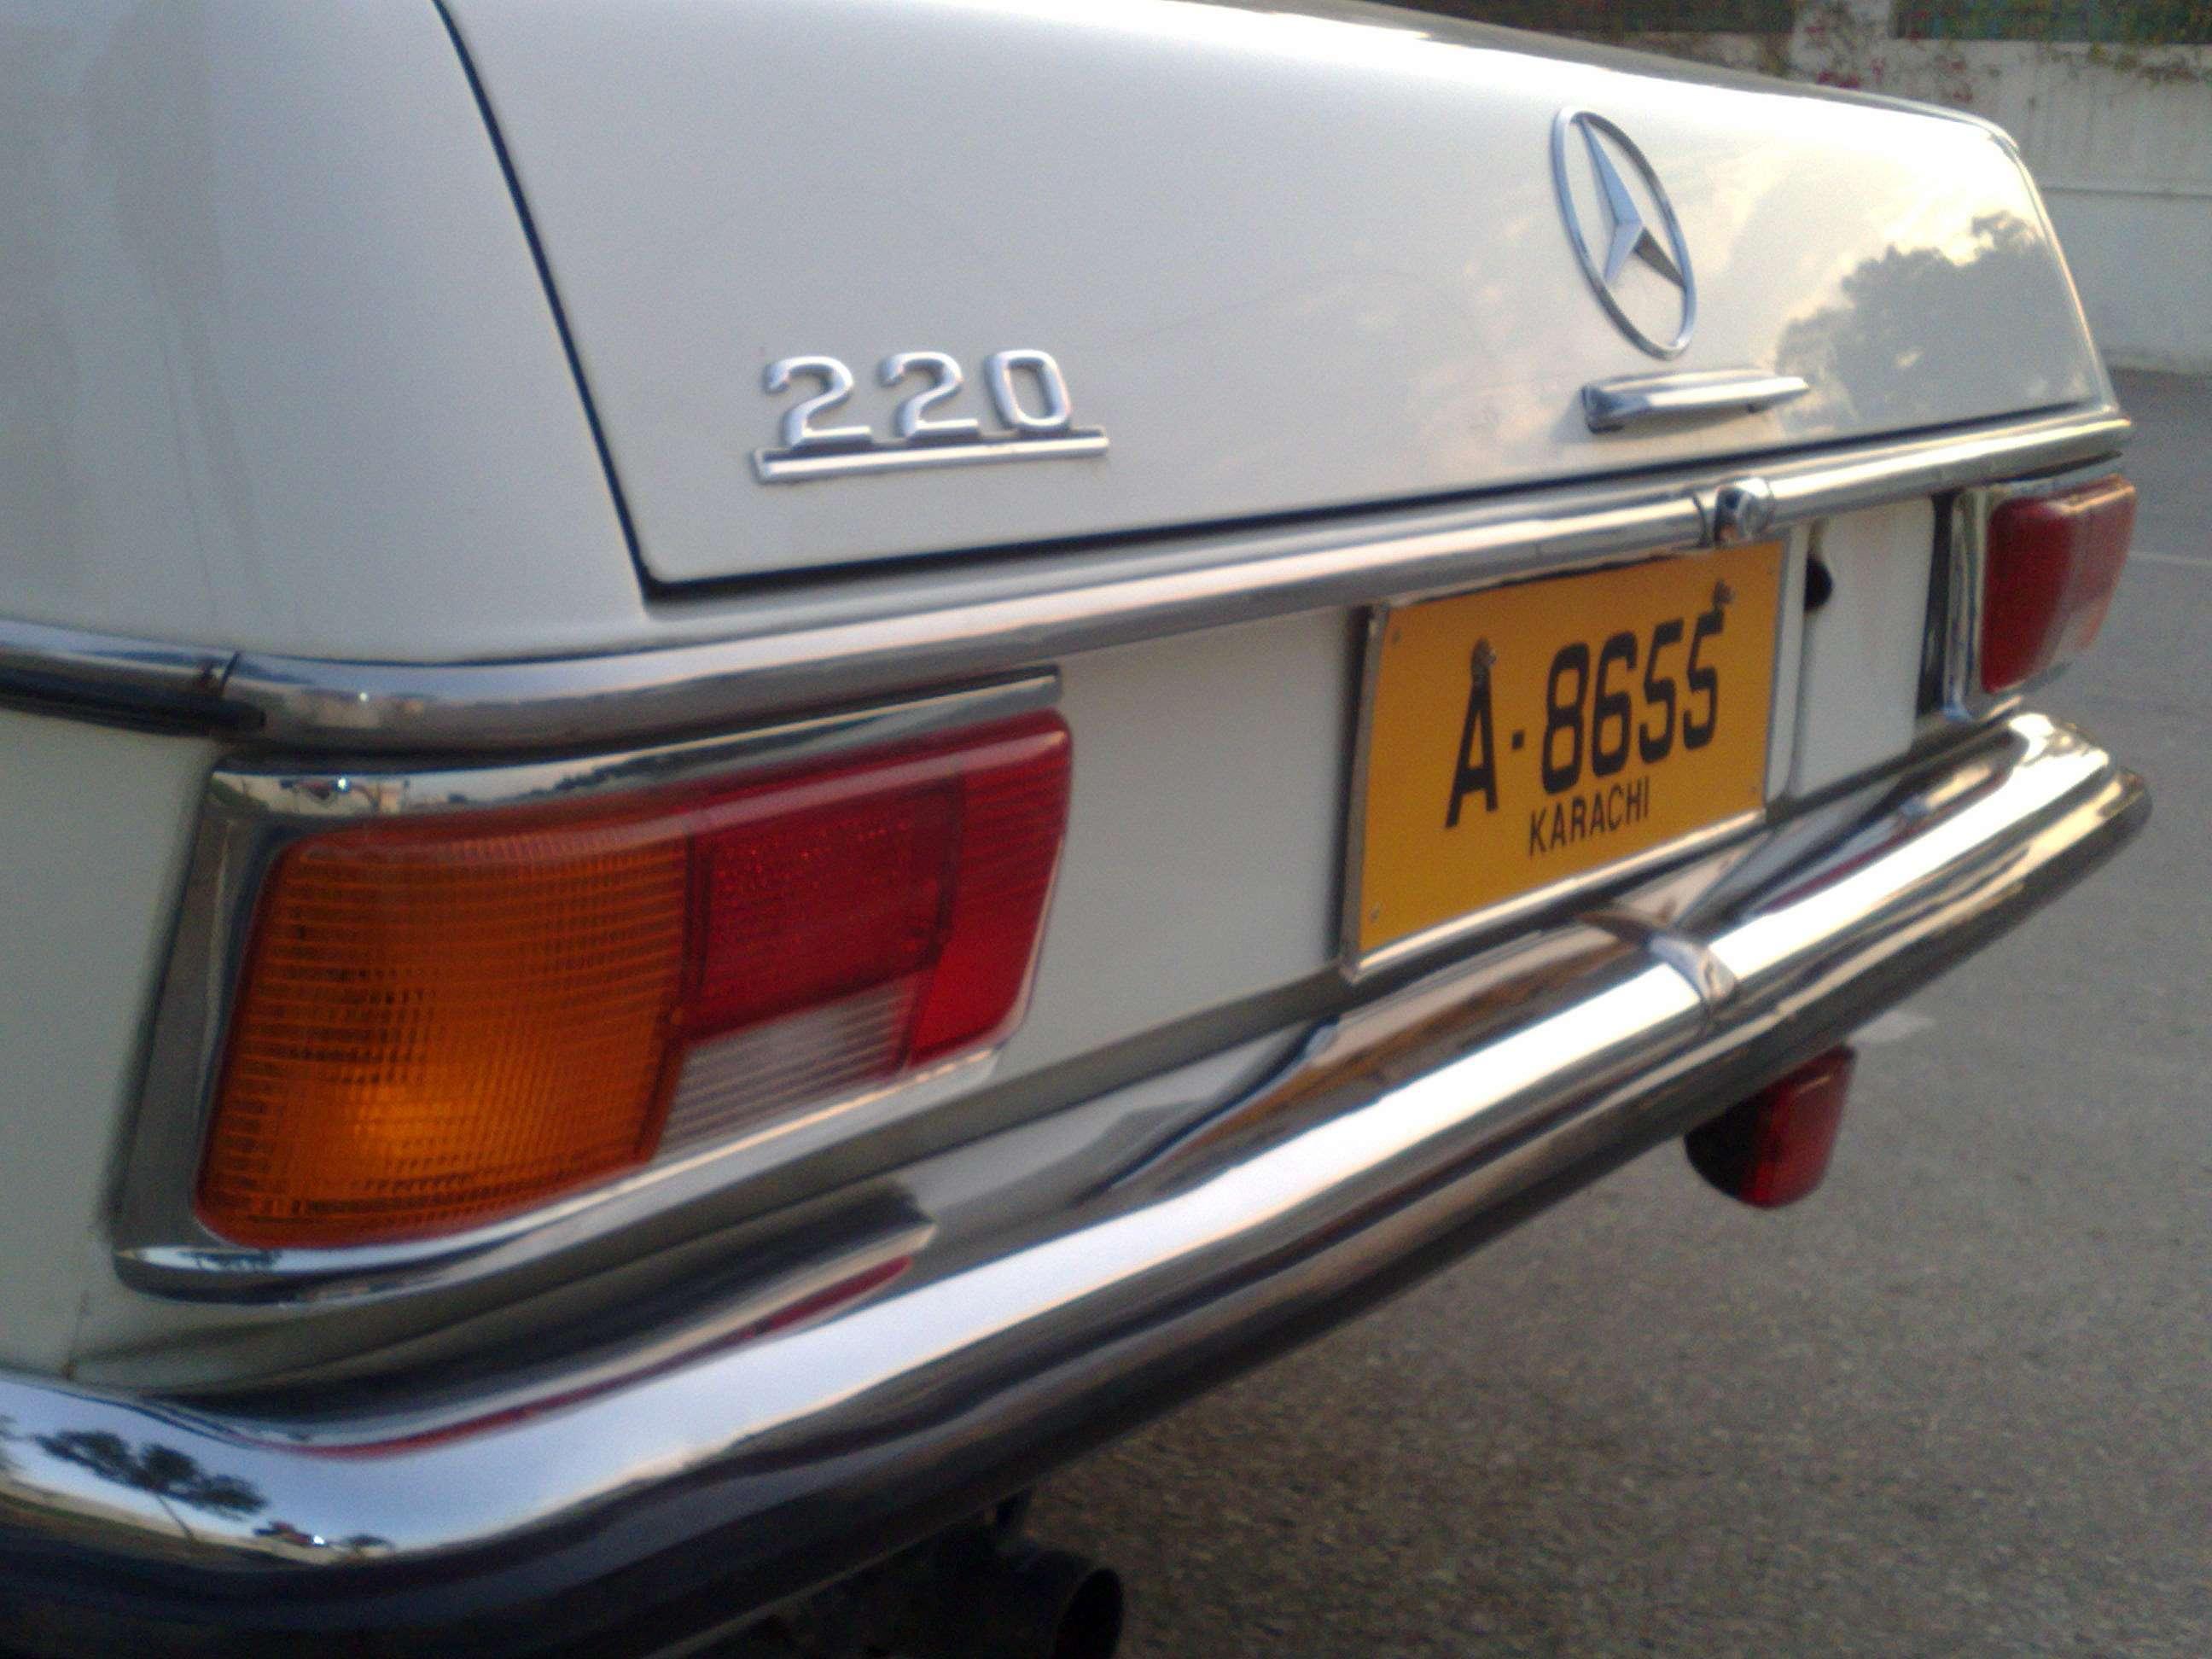 Mercedes Benz E Class - 1972 Mercedes-Benz 220 W115 (YCCC) Image-1